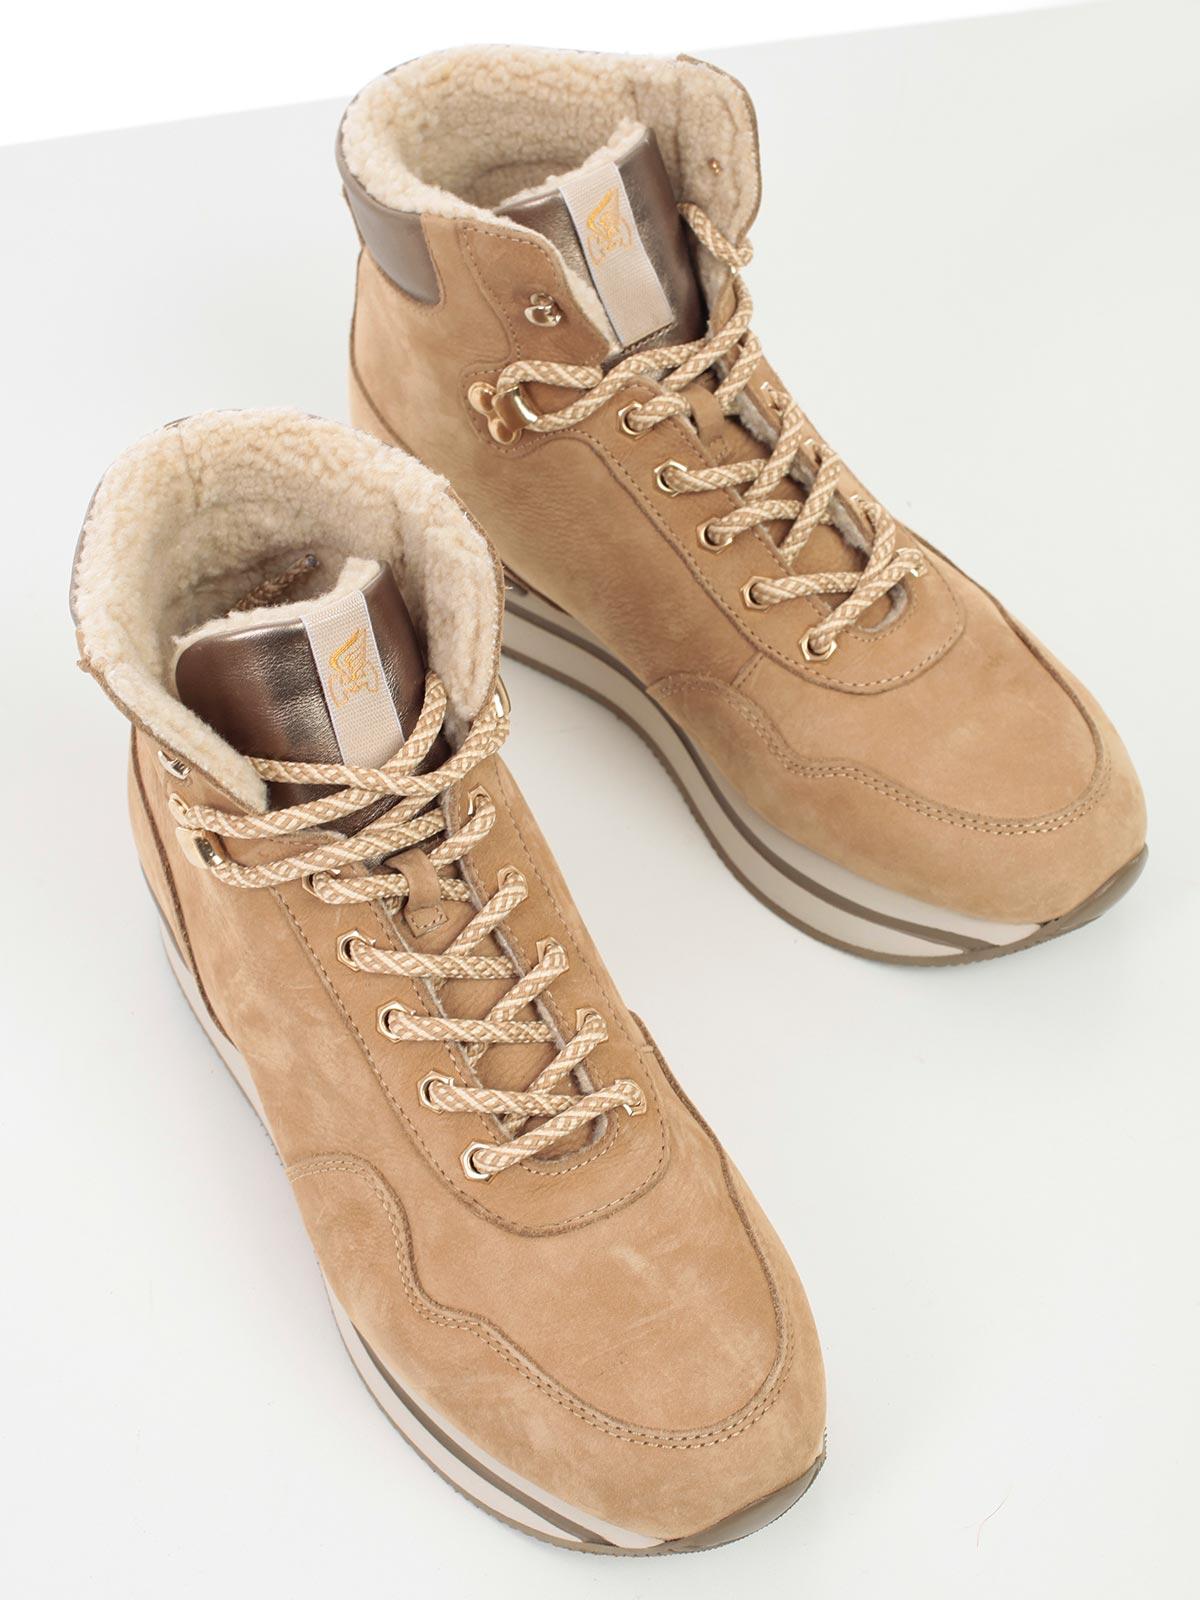 de11ba136ad08 Hogan Shoes HXW2220AP80GI80ZVA - BISCOTTO MEDIO.Bernardelli Store ...